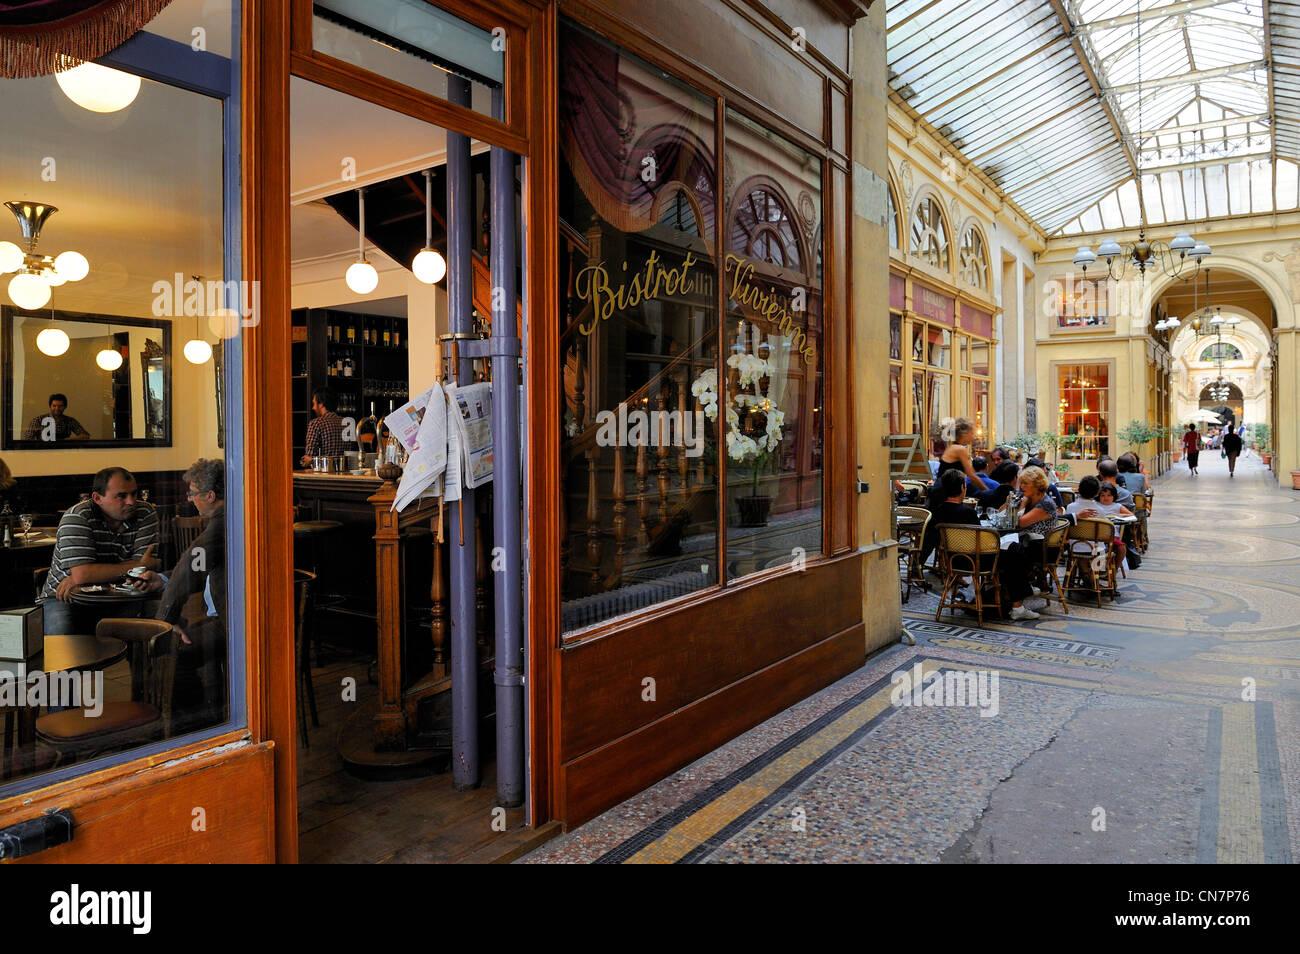 France, Paris, Galerie Vivienne, the Bistrot Vivienne - Stock Image